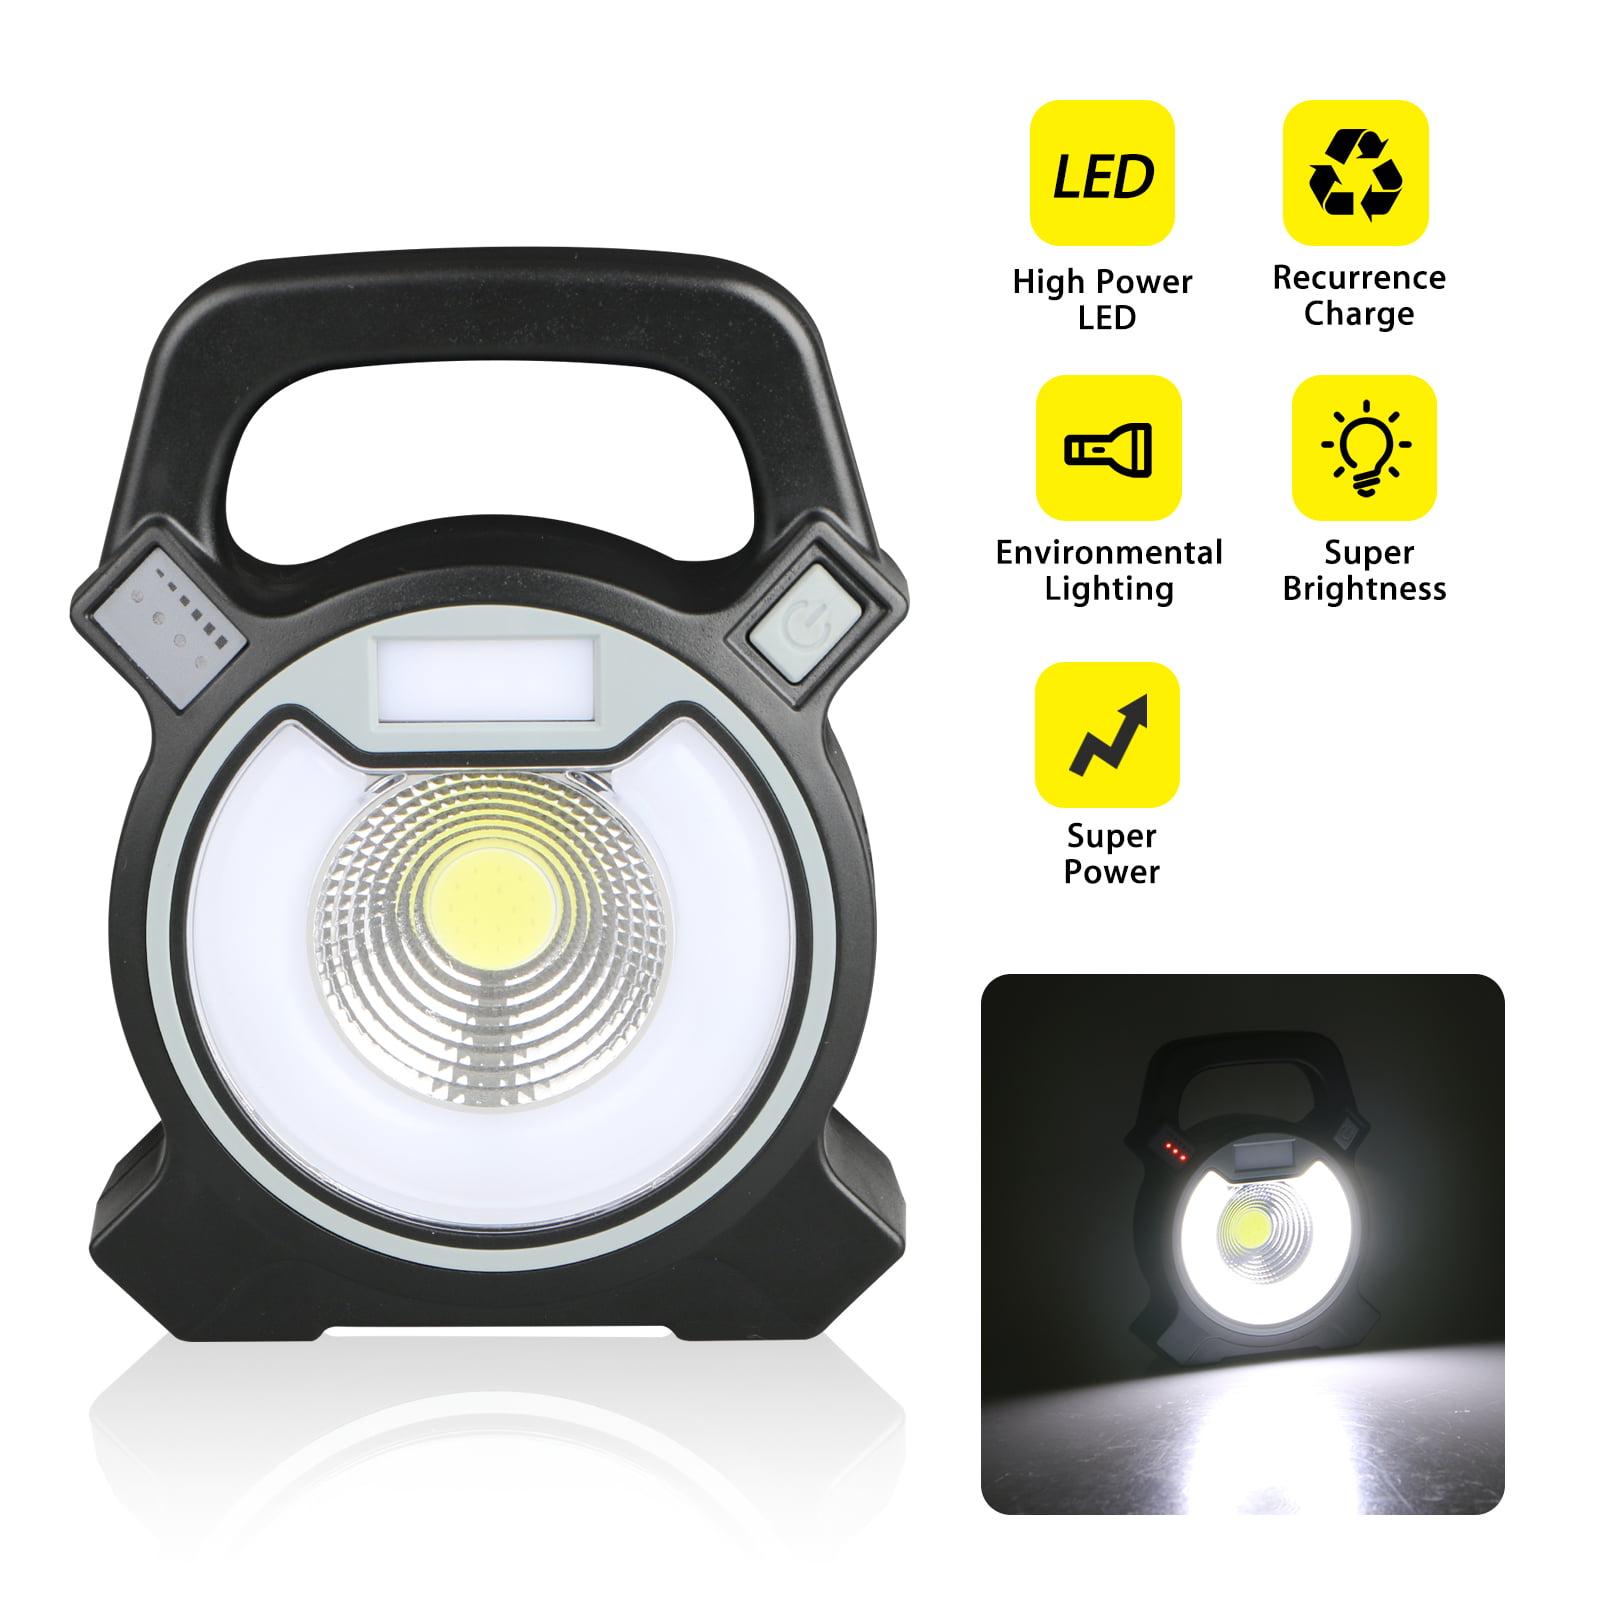 30W Portable Rechargeable LED Flood Light Outdoor Garden Work Spot Lamp